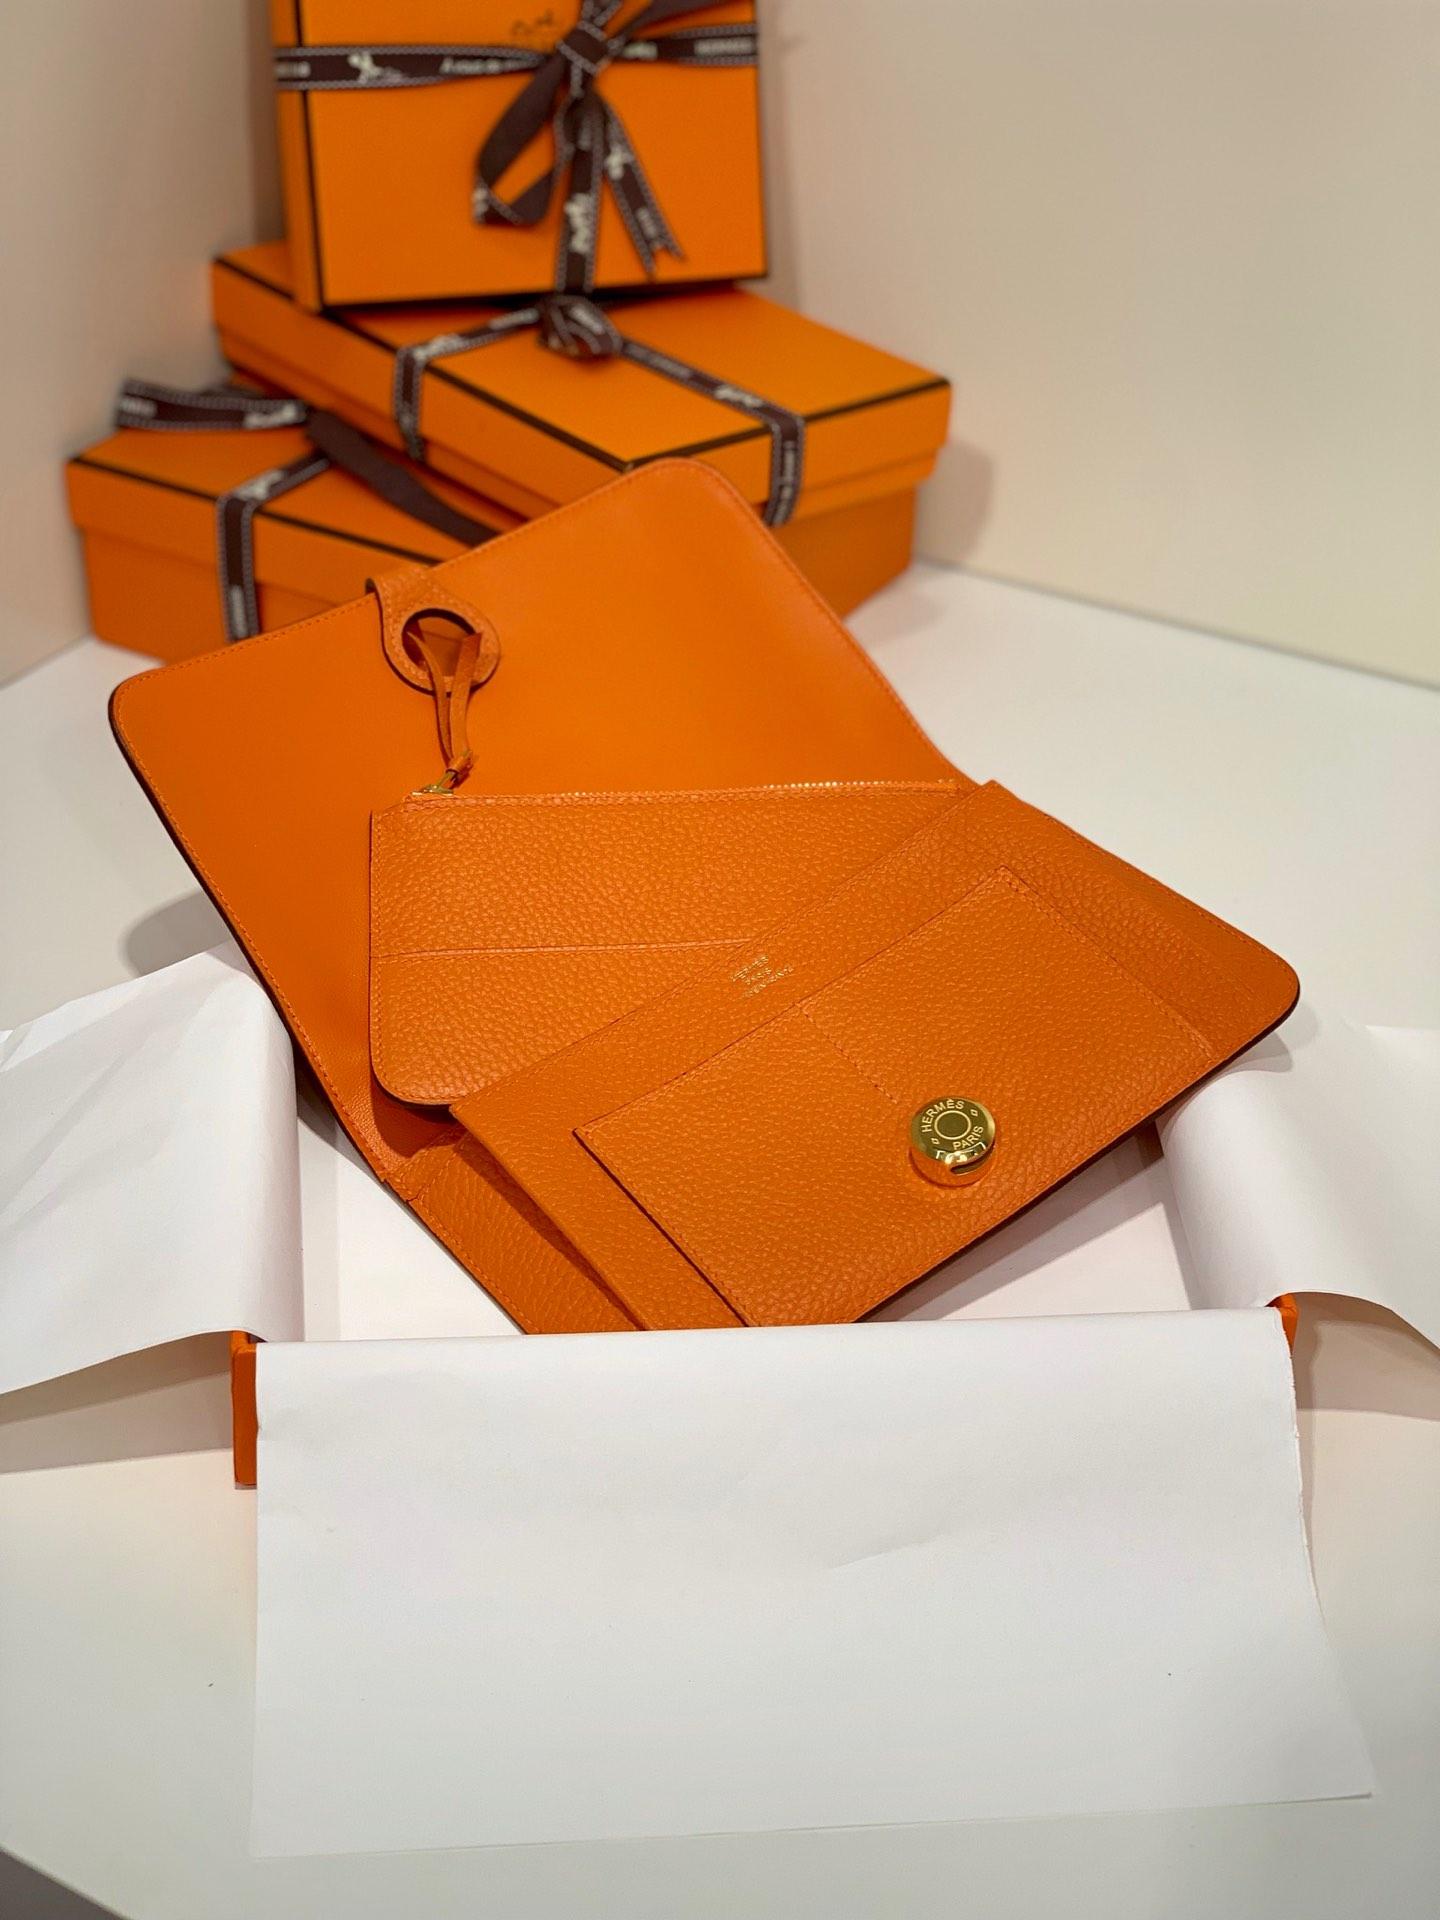 Hermes Dogon护照本 爱马仕橙色Togo牛皮Dogon钱包手包 金扣